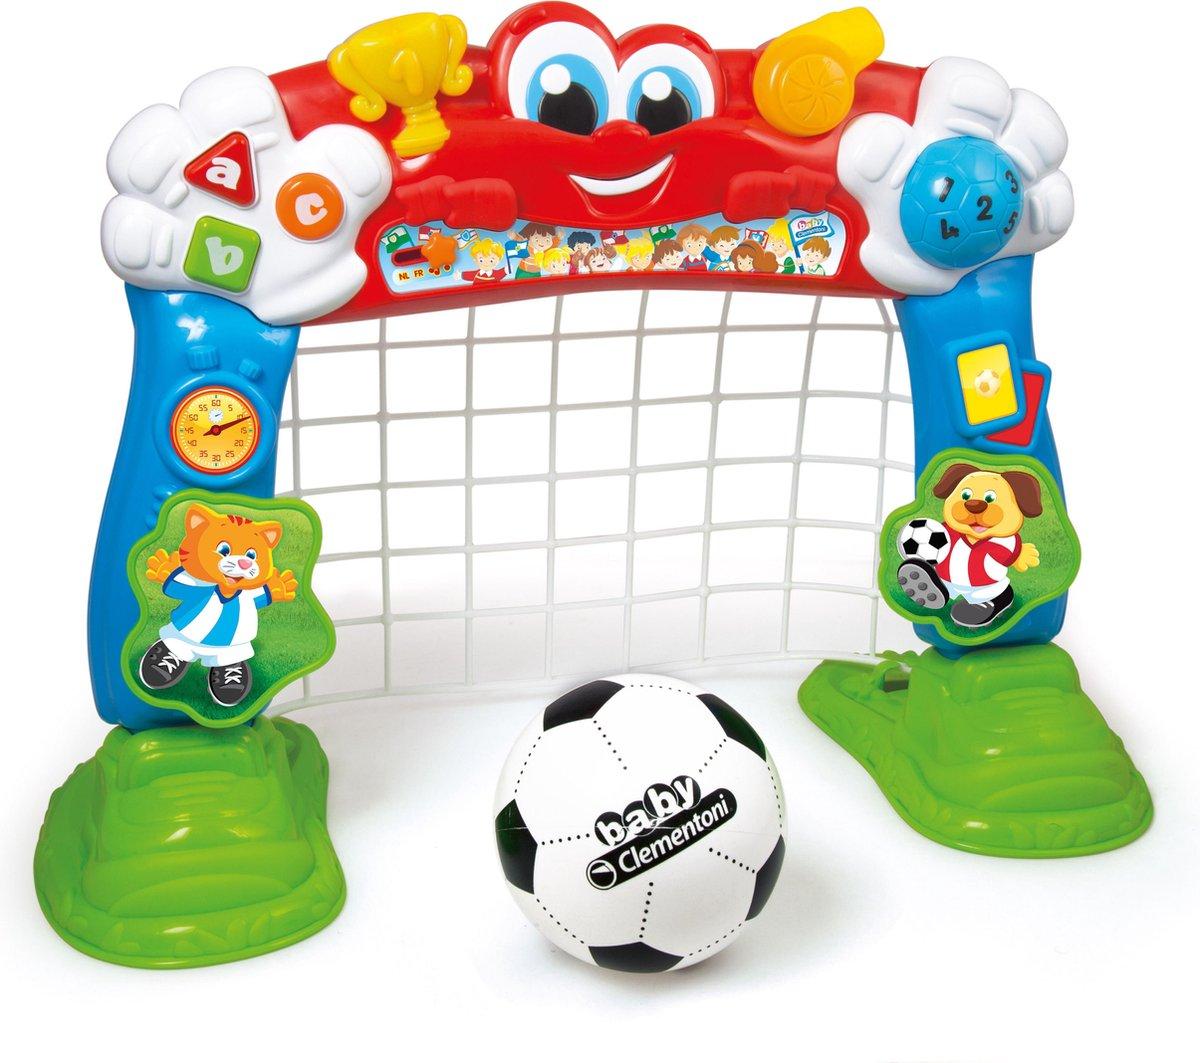 Pratend Voetbalspel - Clementoni